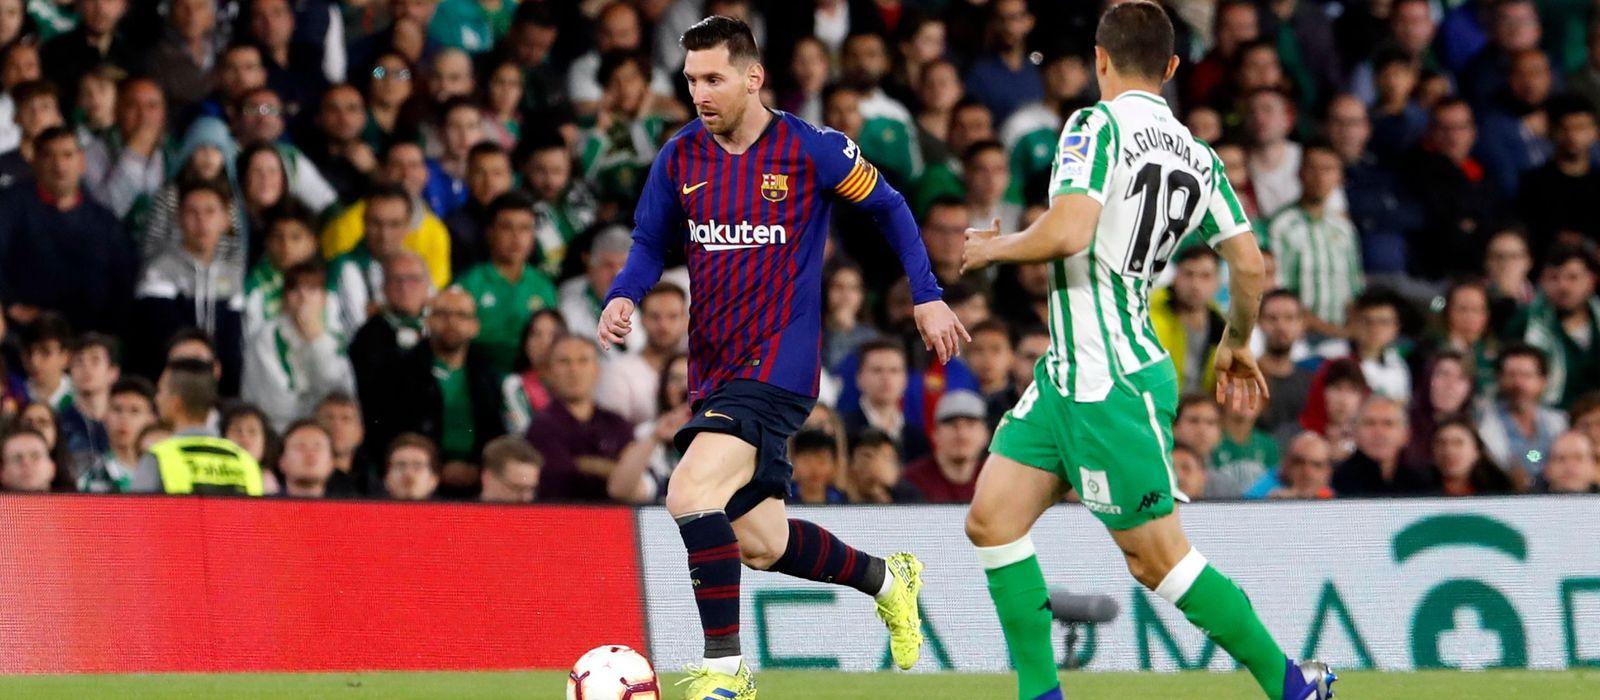 Messi's stunner at the Benito Villamarín on shortlist for Puskás Award